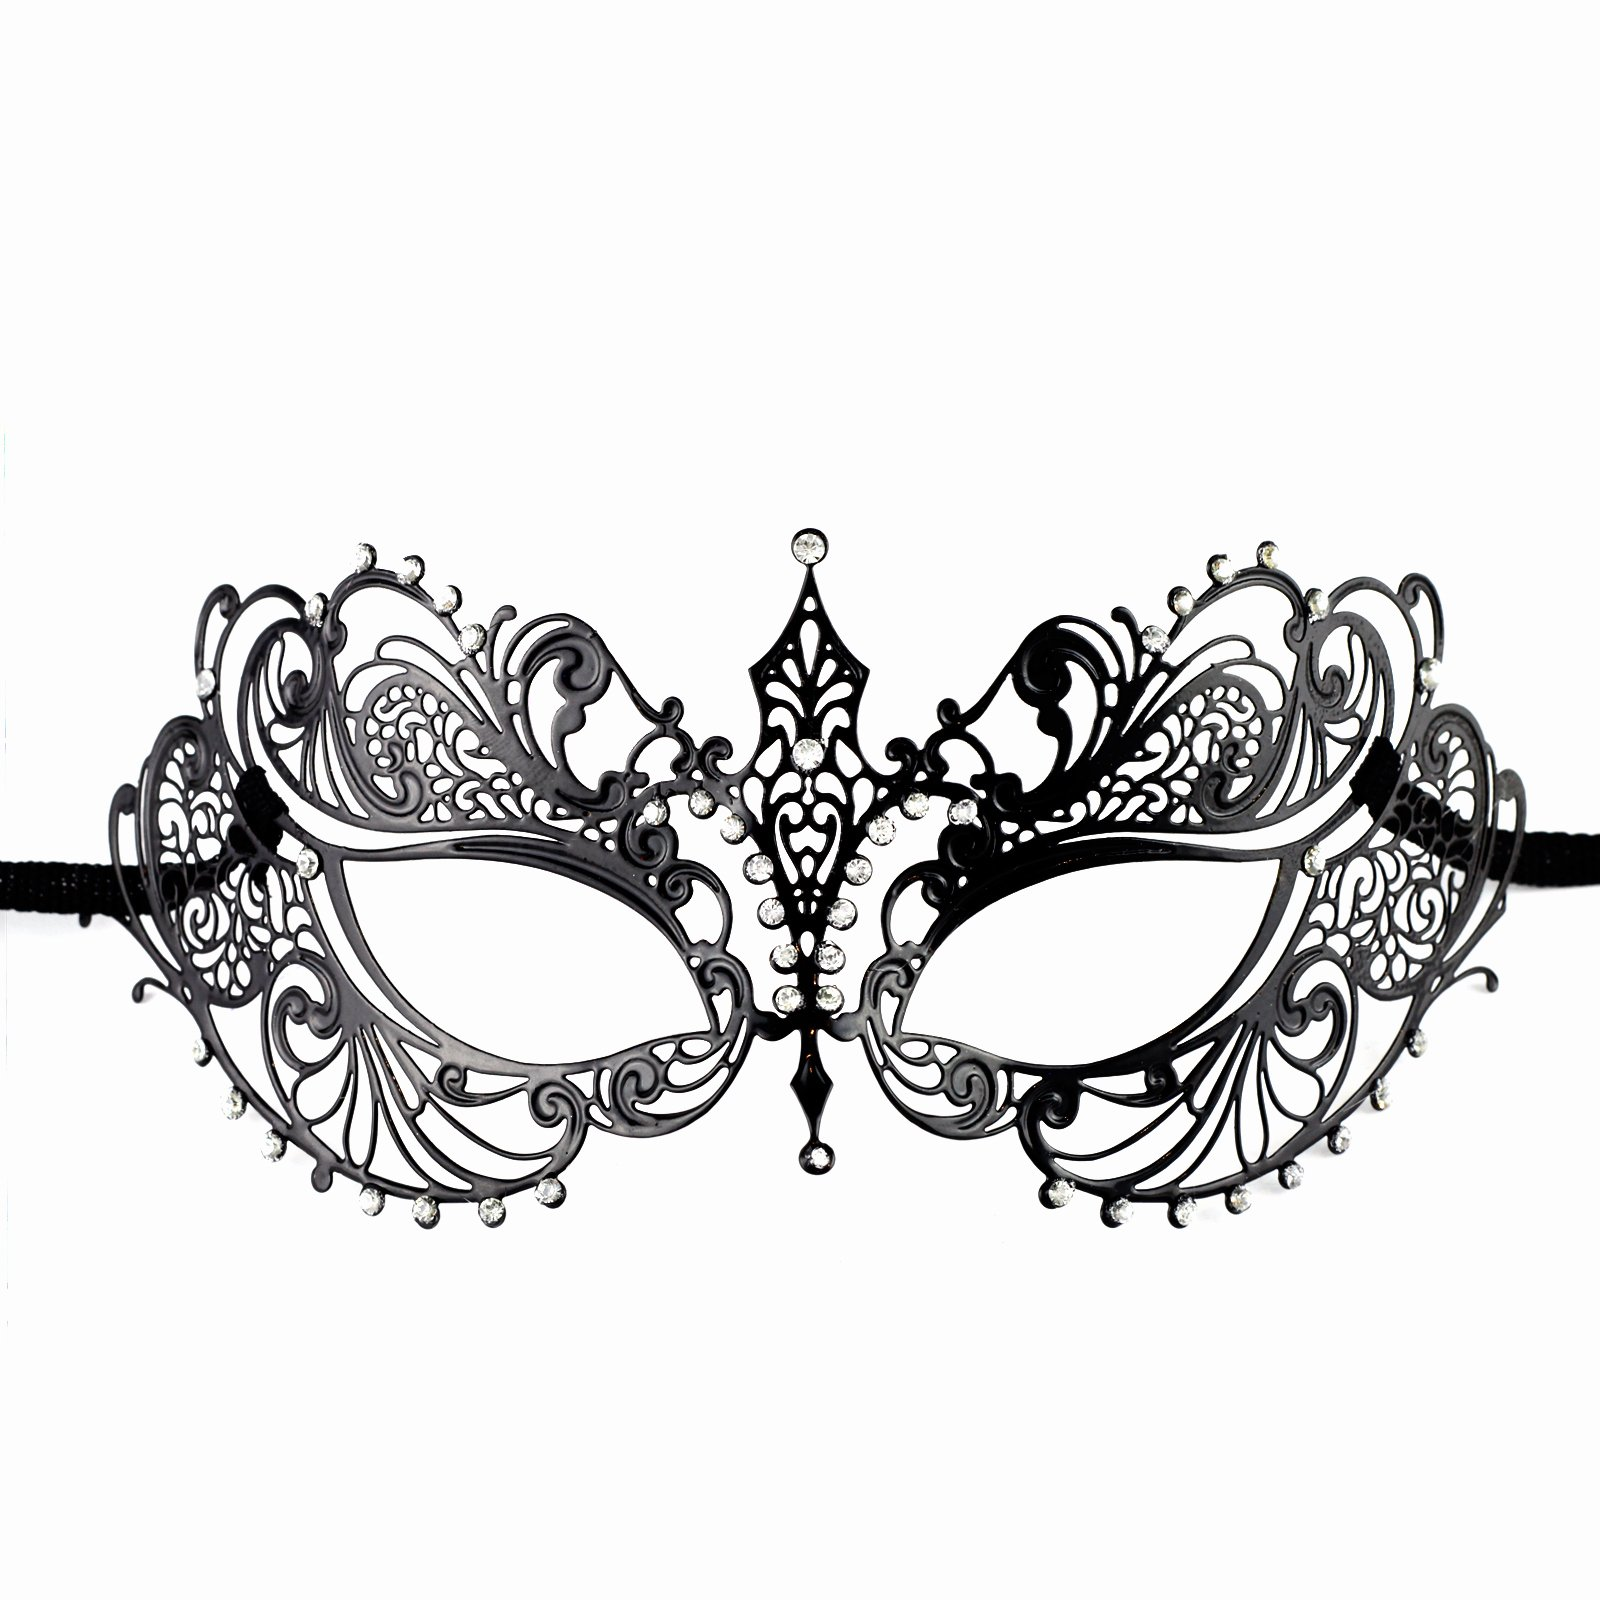 Diy Masquerade Mask Template Elegant Best S Of Mardi Gra Masquerade Mask Template Mardi